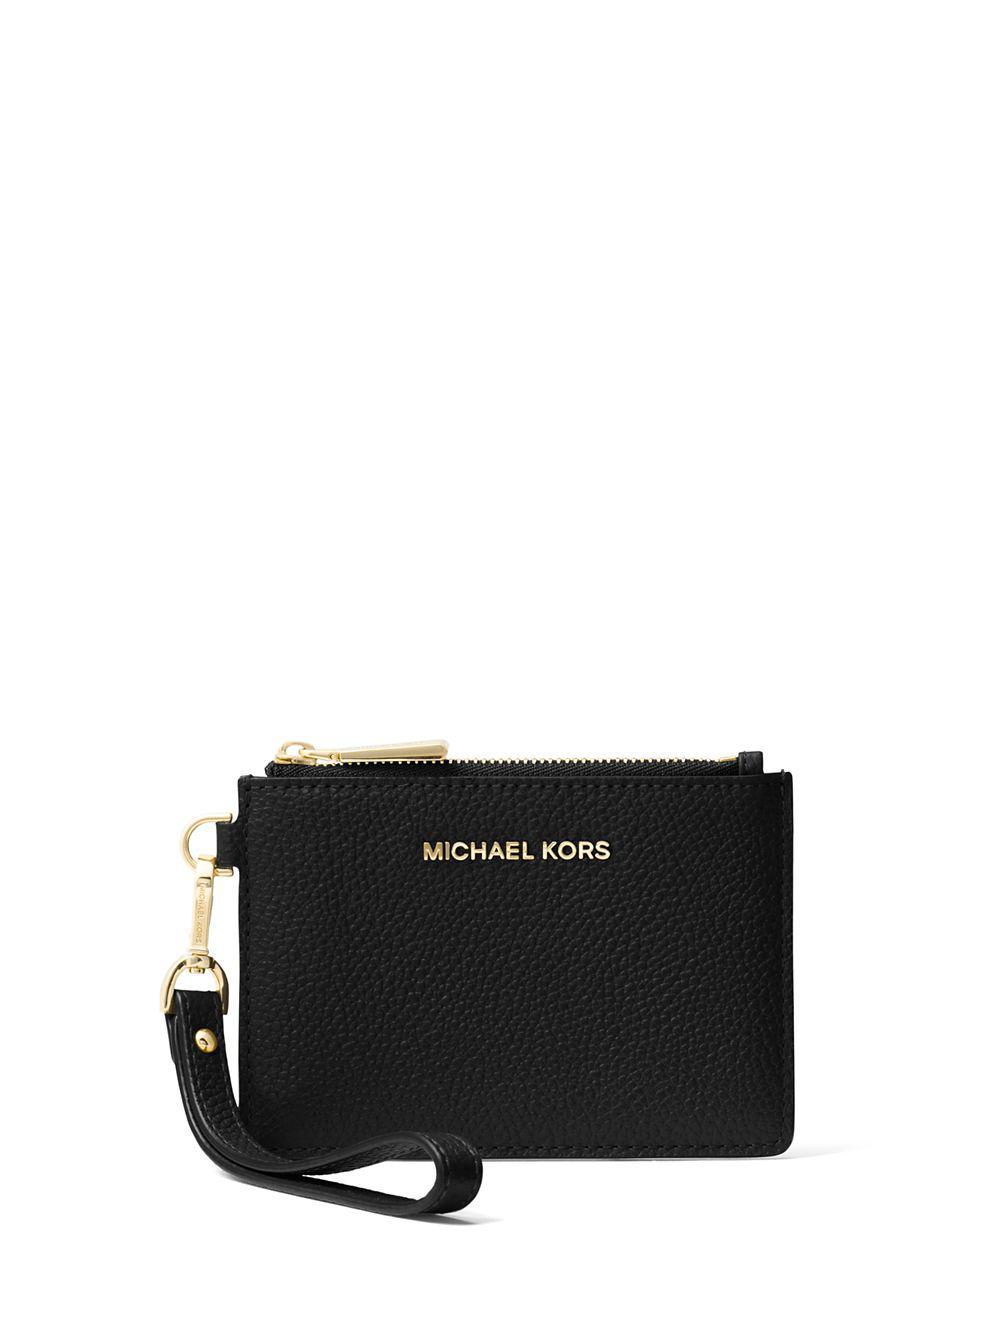 f6cc78b606e2 Michael Michael Kors Mercer Leather Coin Purse in Black - Lyst